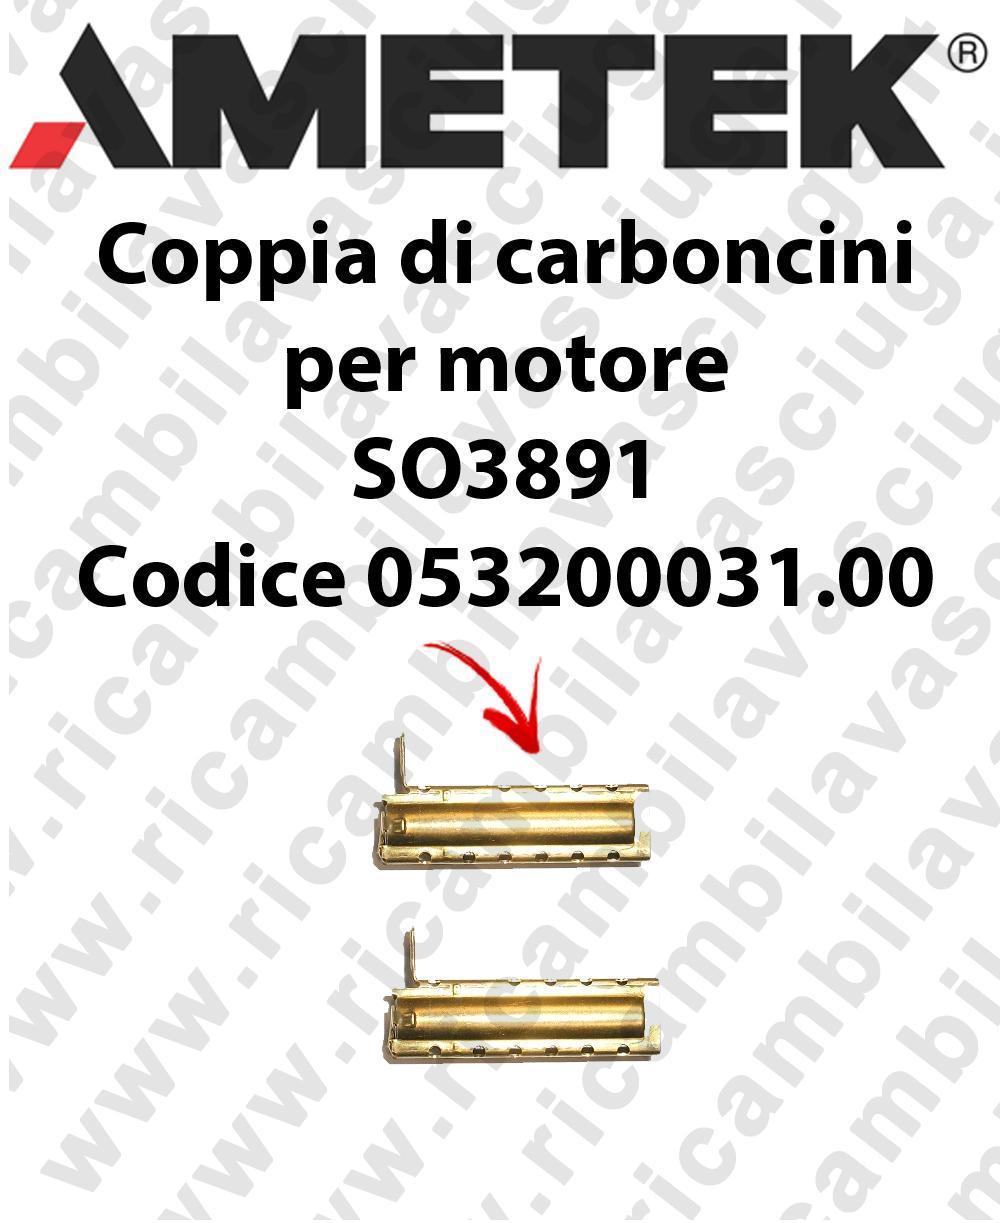 COPPIA di Carboncini Motore de aspiración para motore  Ametek SO3891 Cod: 053200031.00